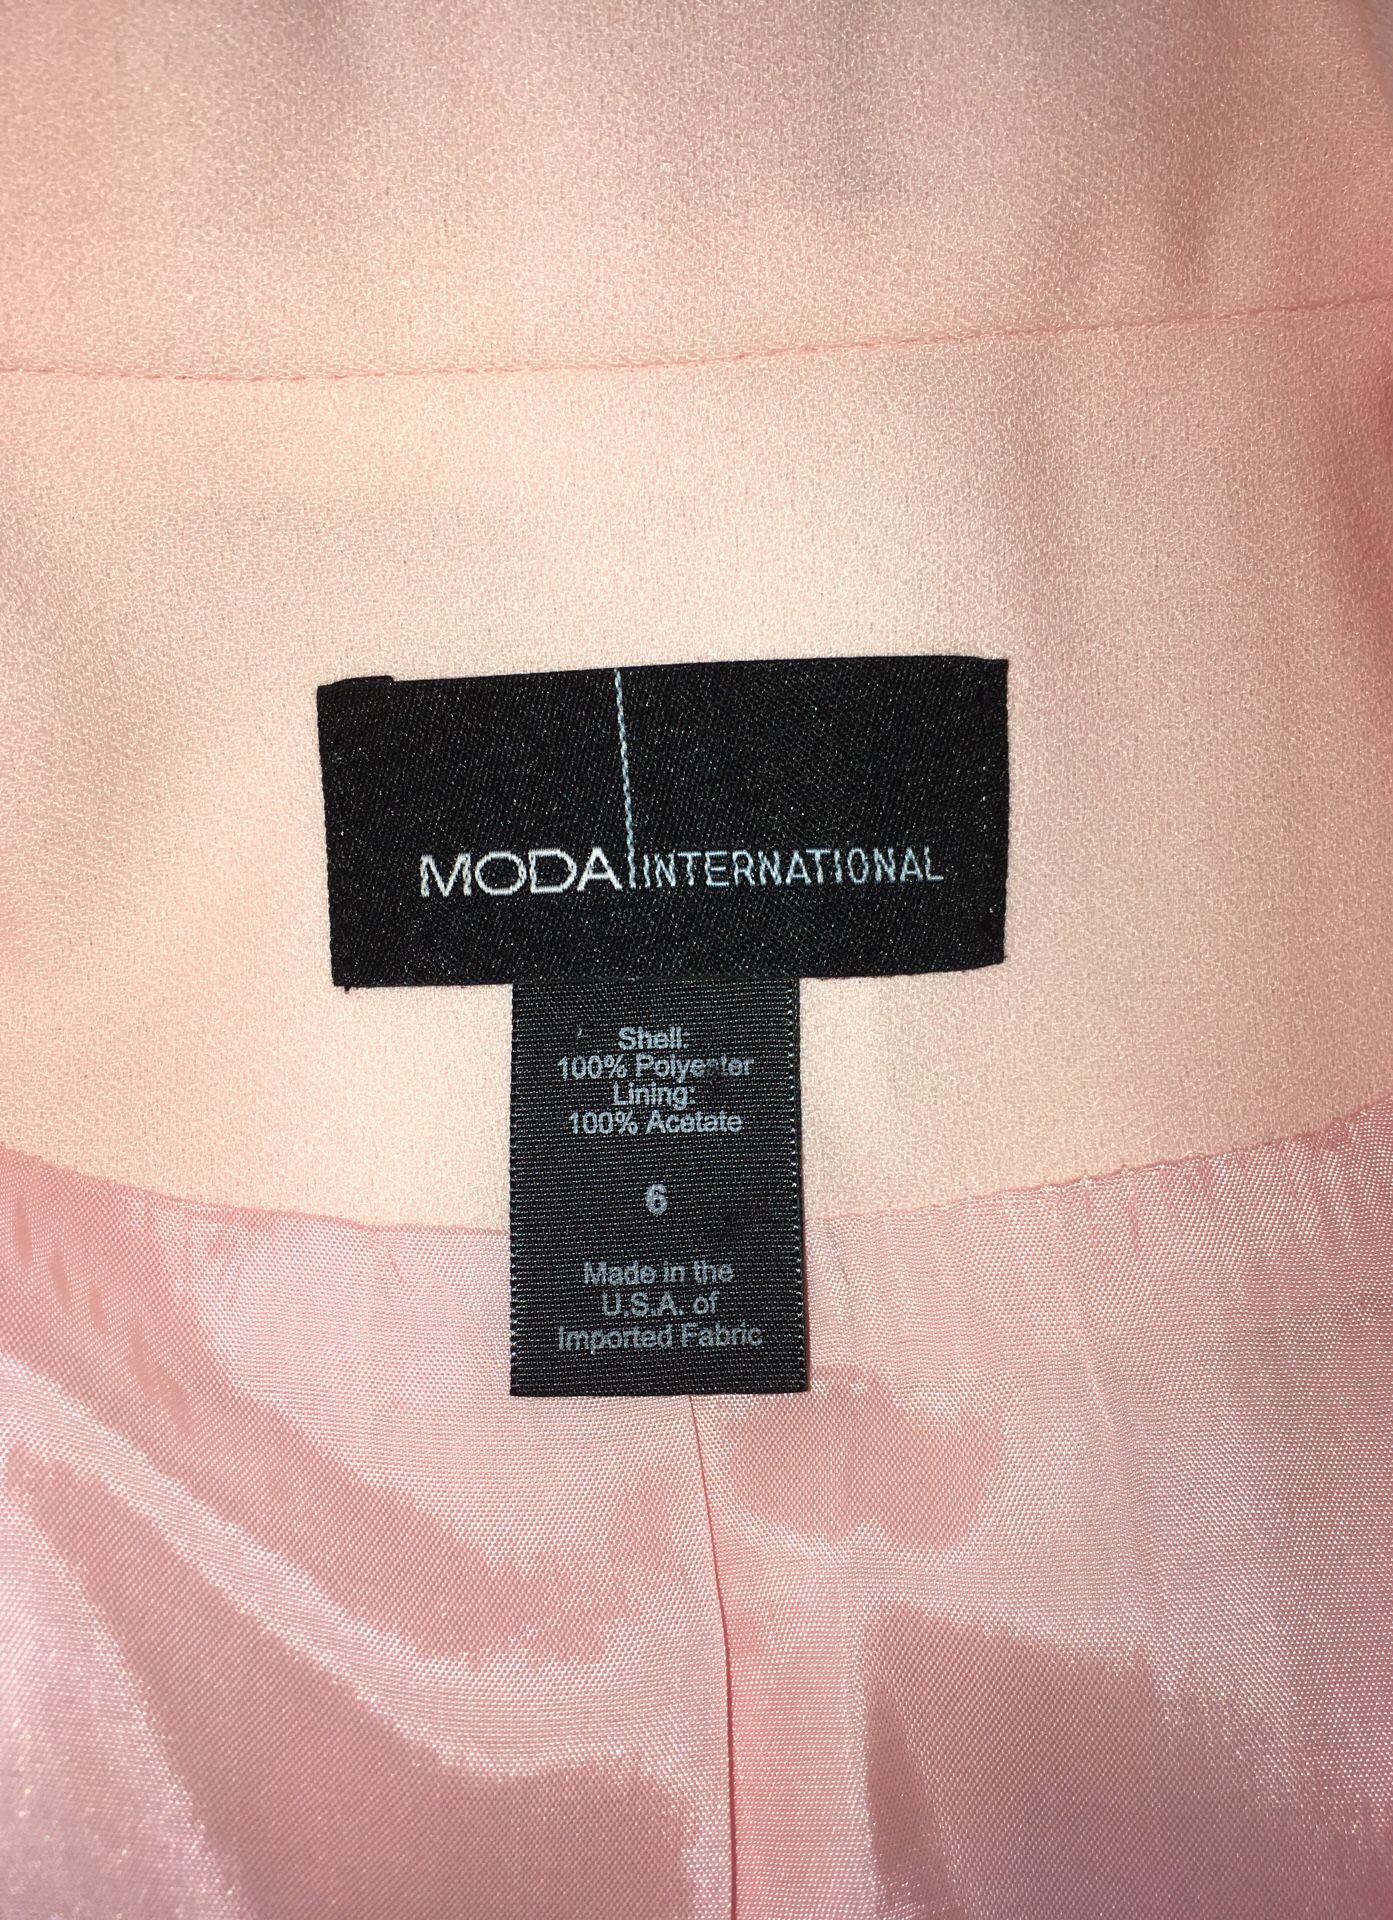 Moda International Suit